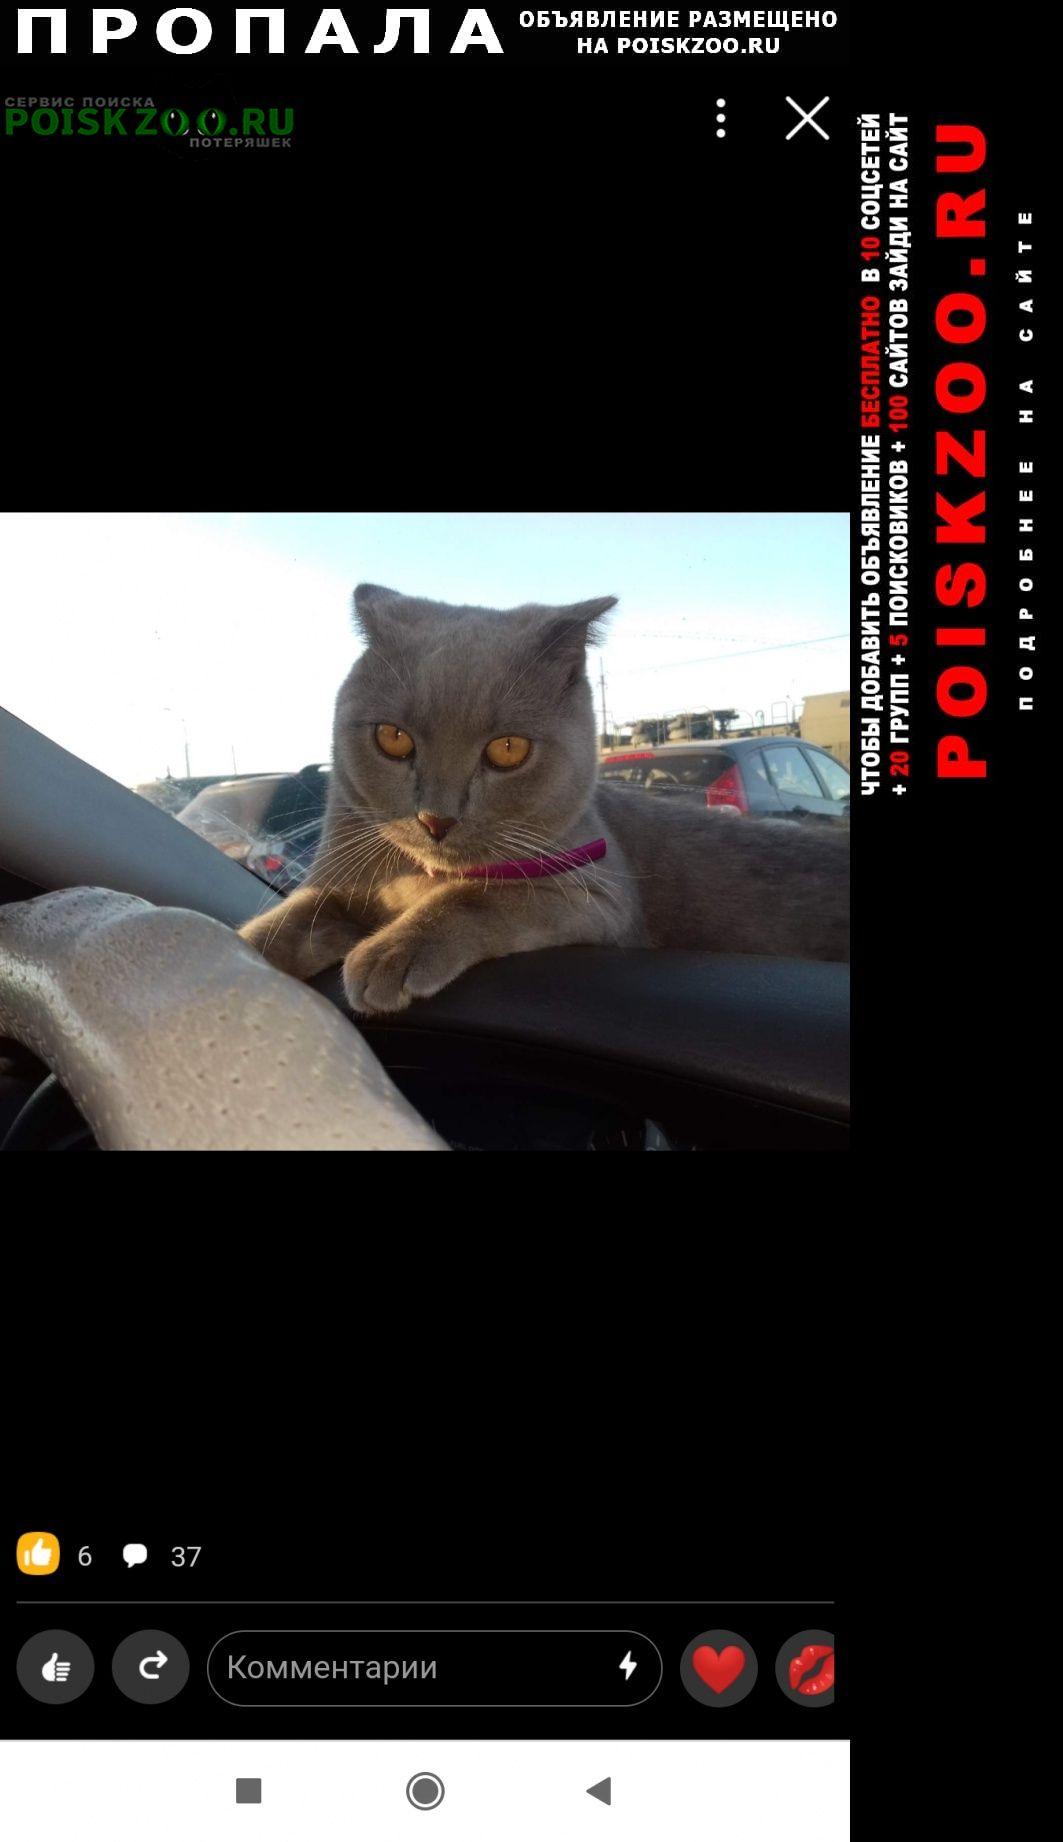 Пропал кот месяц назад барсик Судак